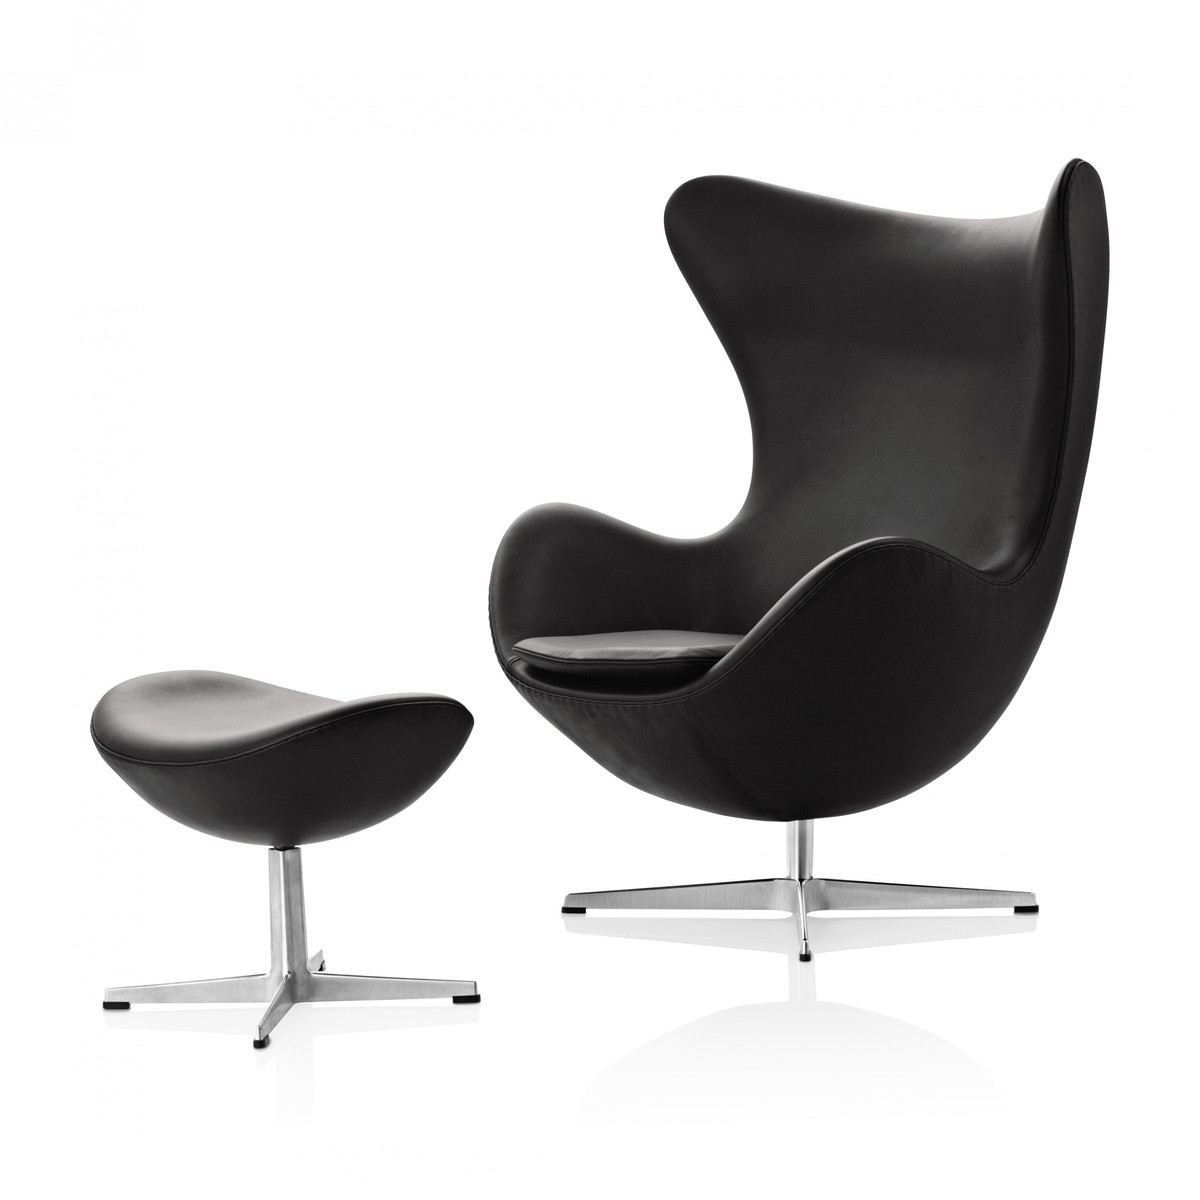 egg chair footstool leather fritz hansen. Black Bedroom Furniture Sets. Home Design Ideas